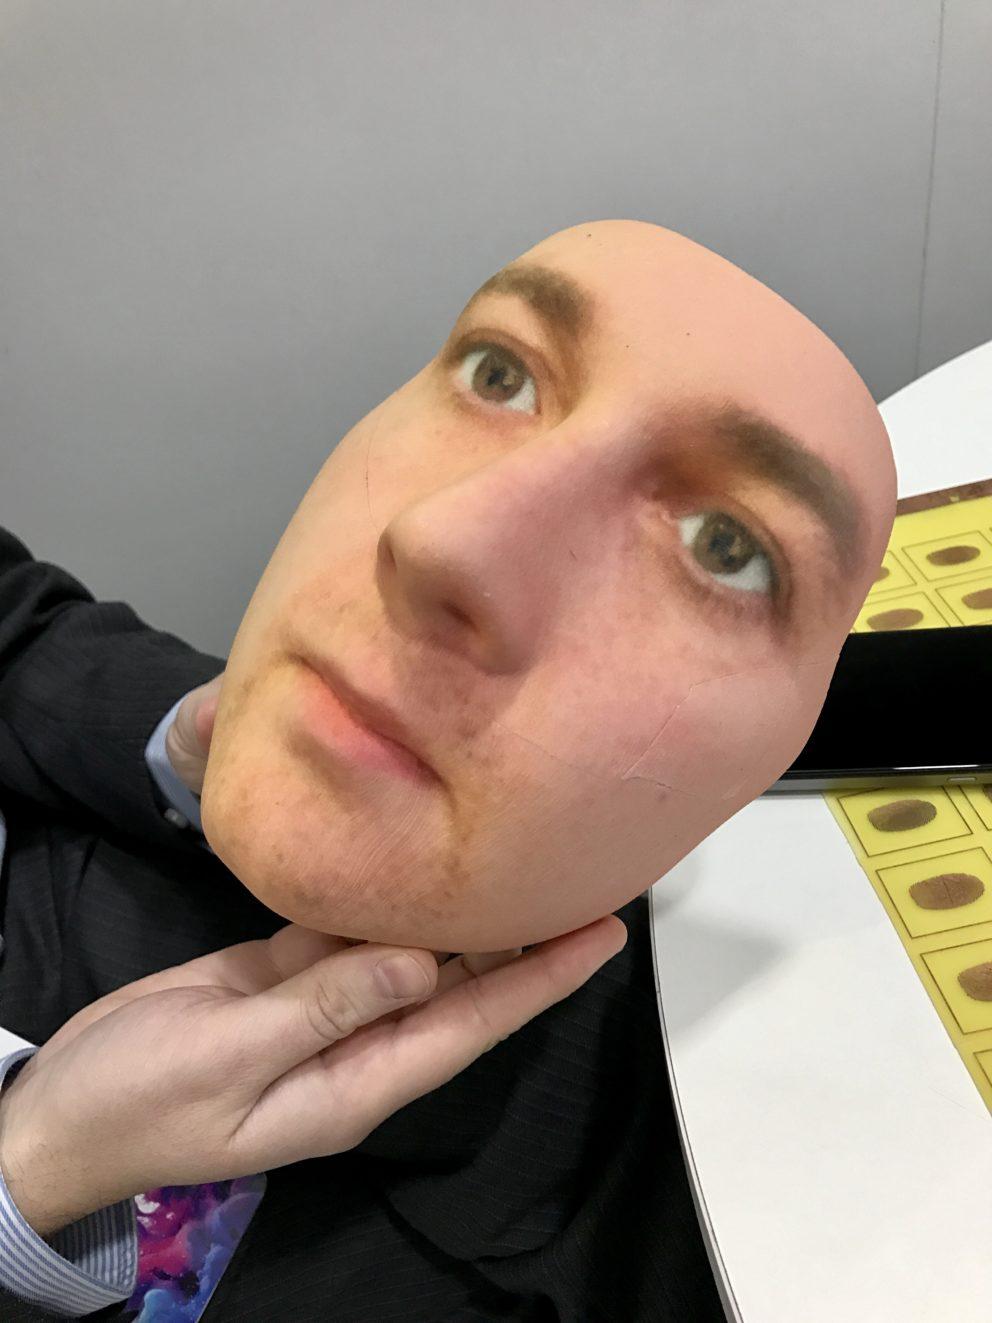 Biometrics facial scanners good when